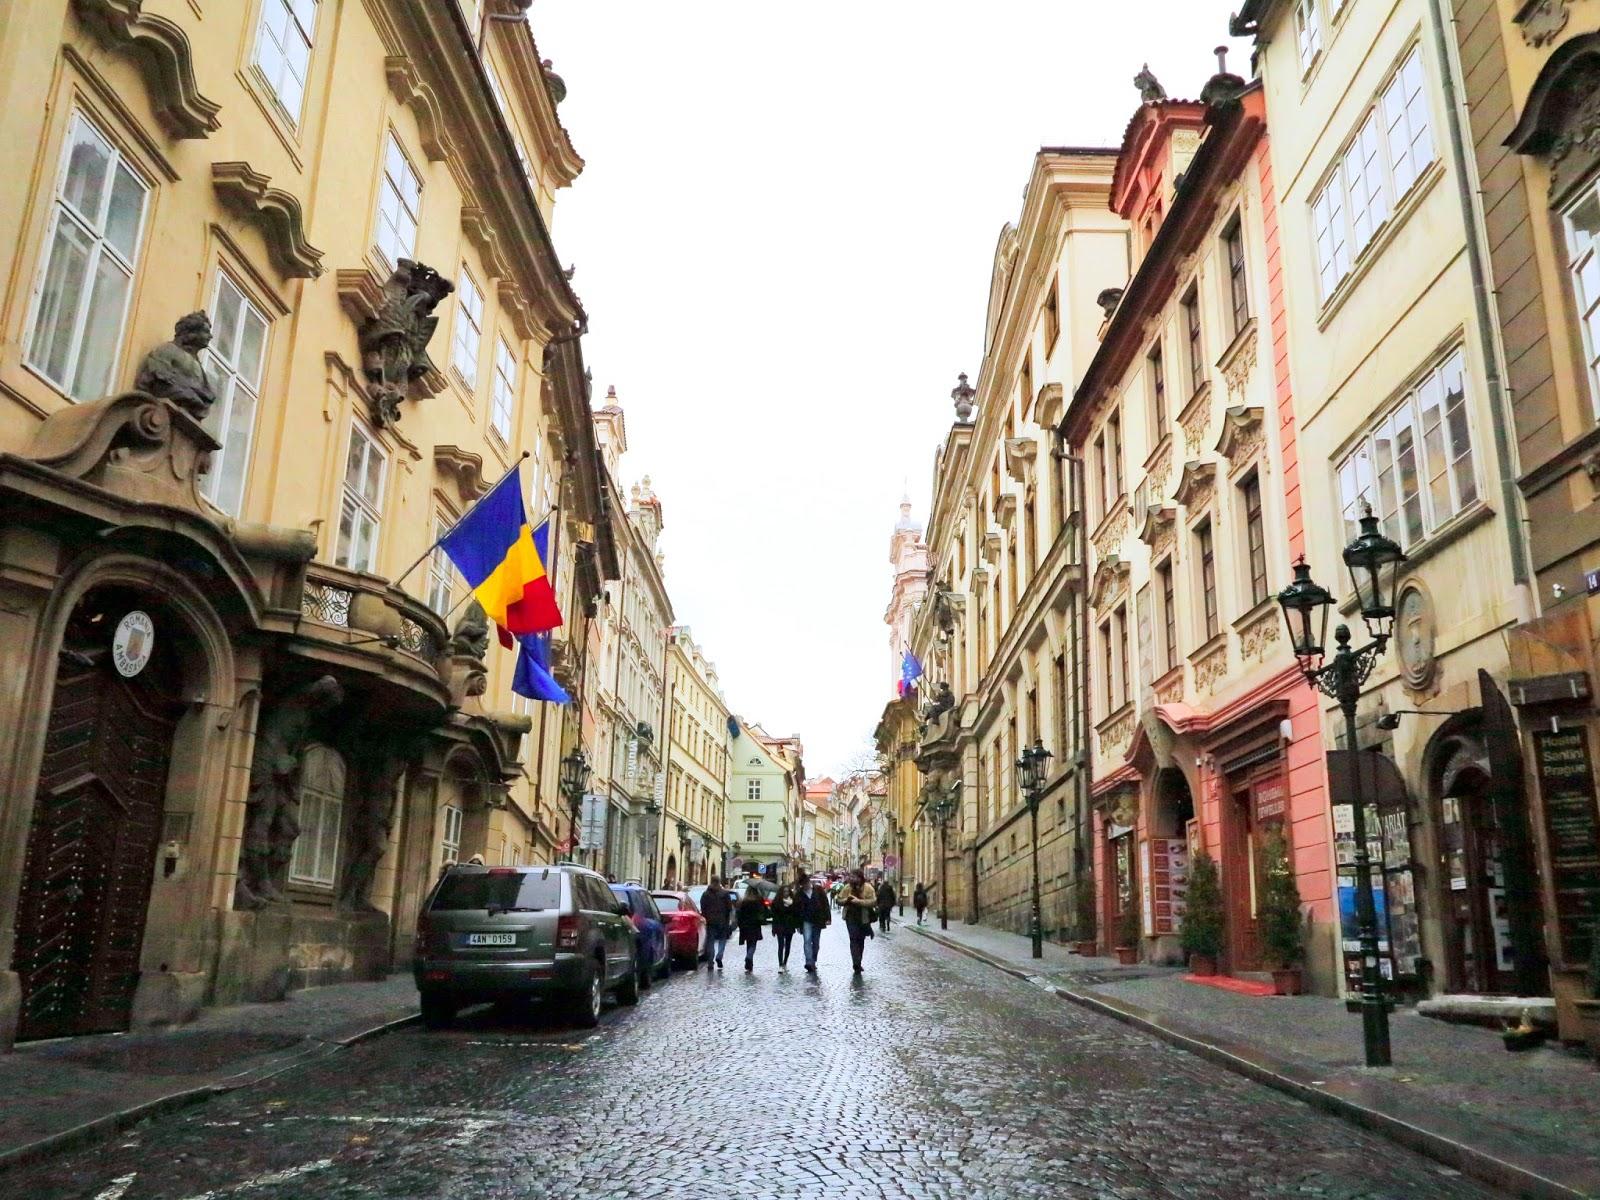 privat praha 4 czech streets